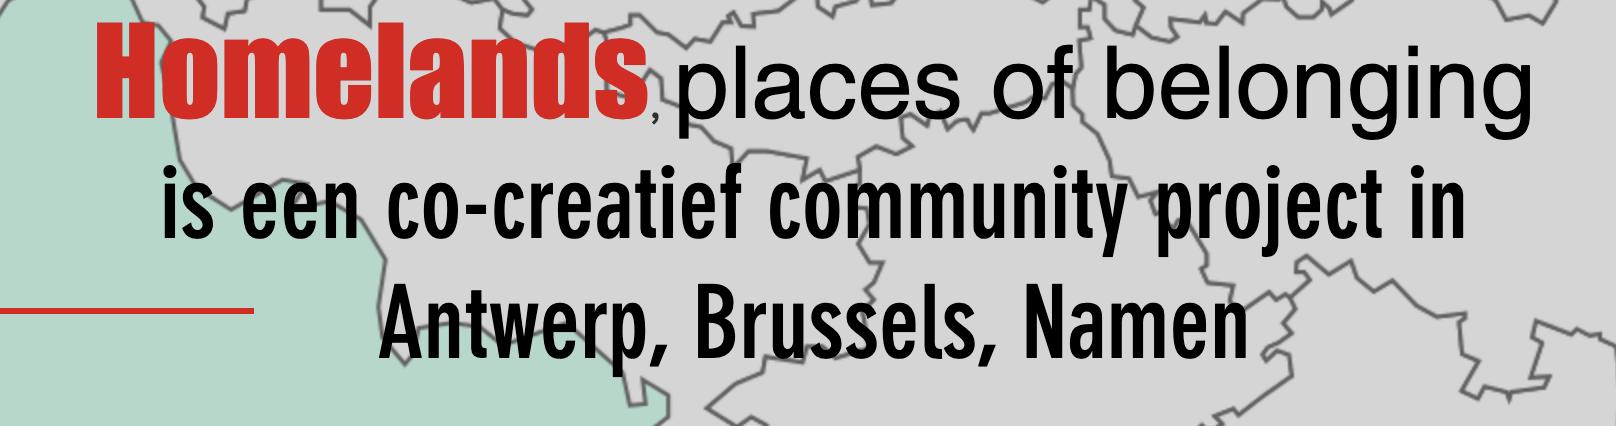 homeland places of belonging